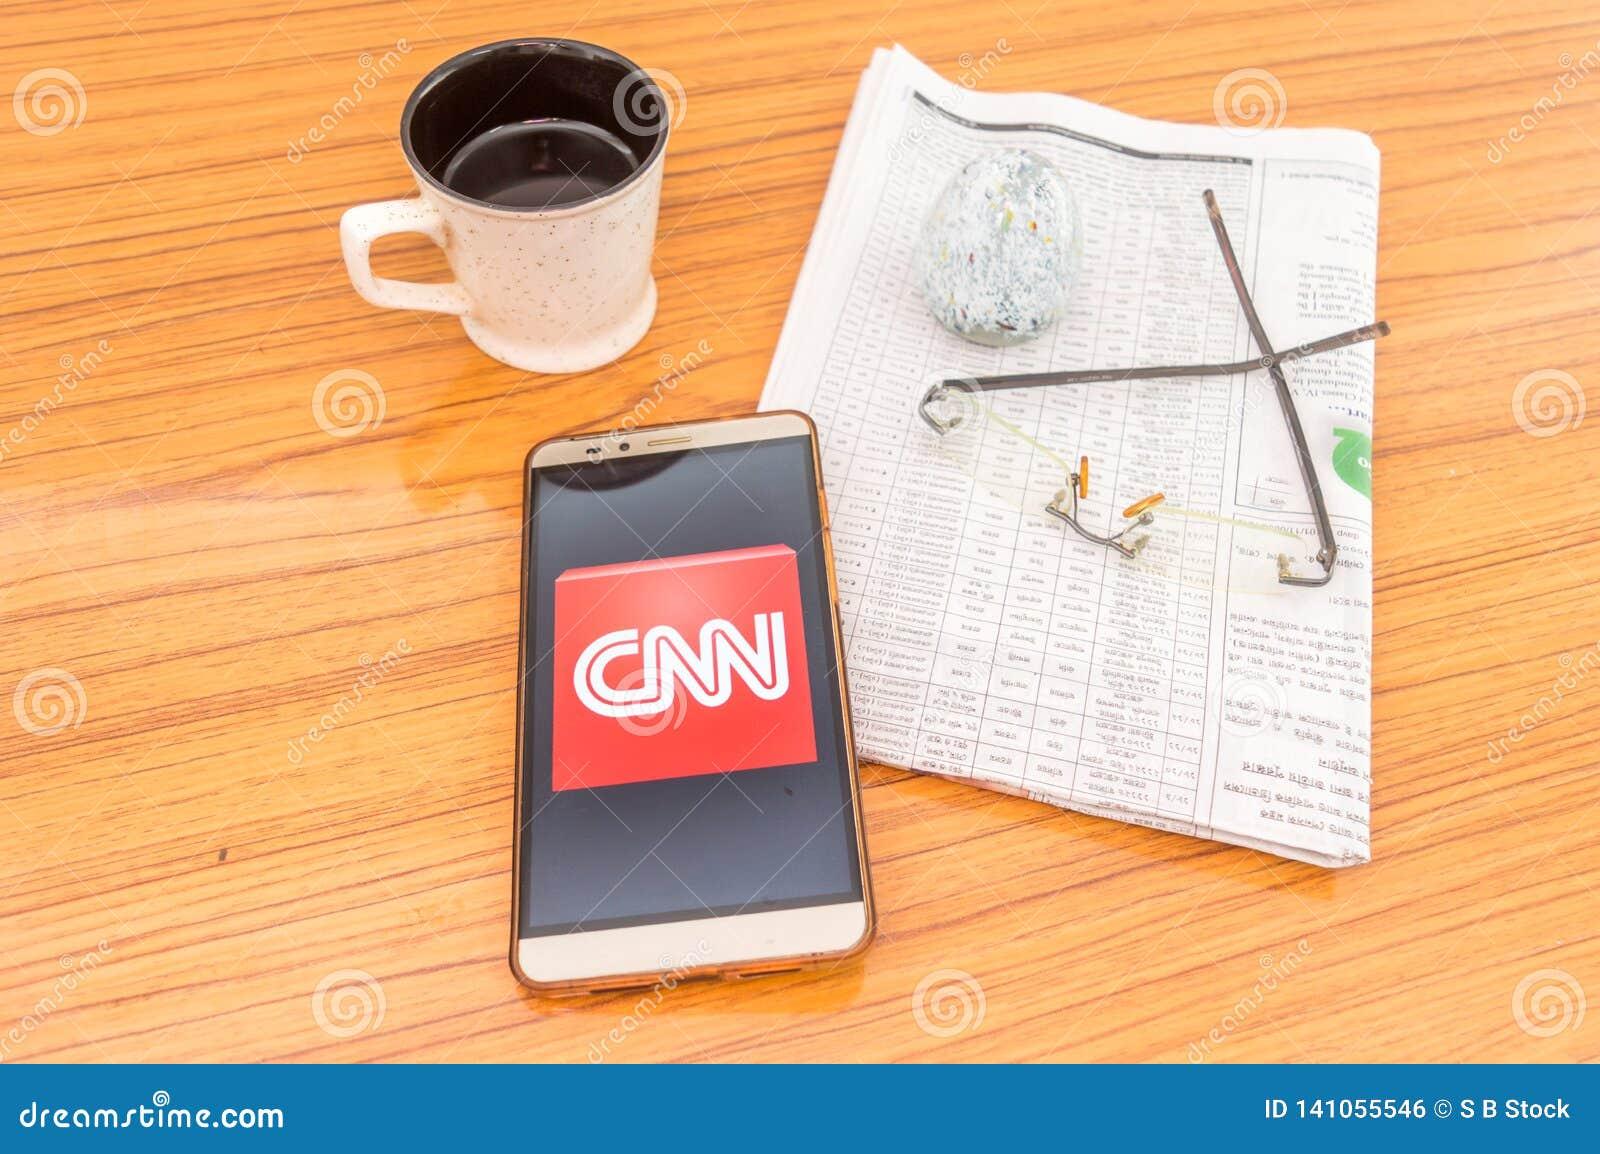 Kolkata, India, February 3, 2019: CNN News App Application